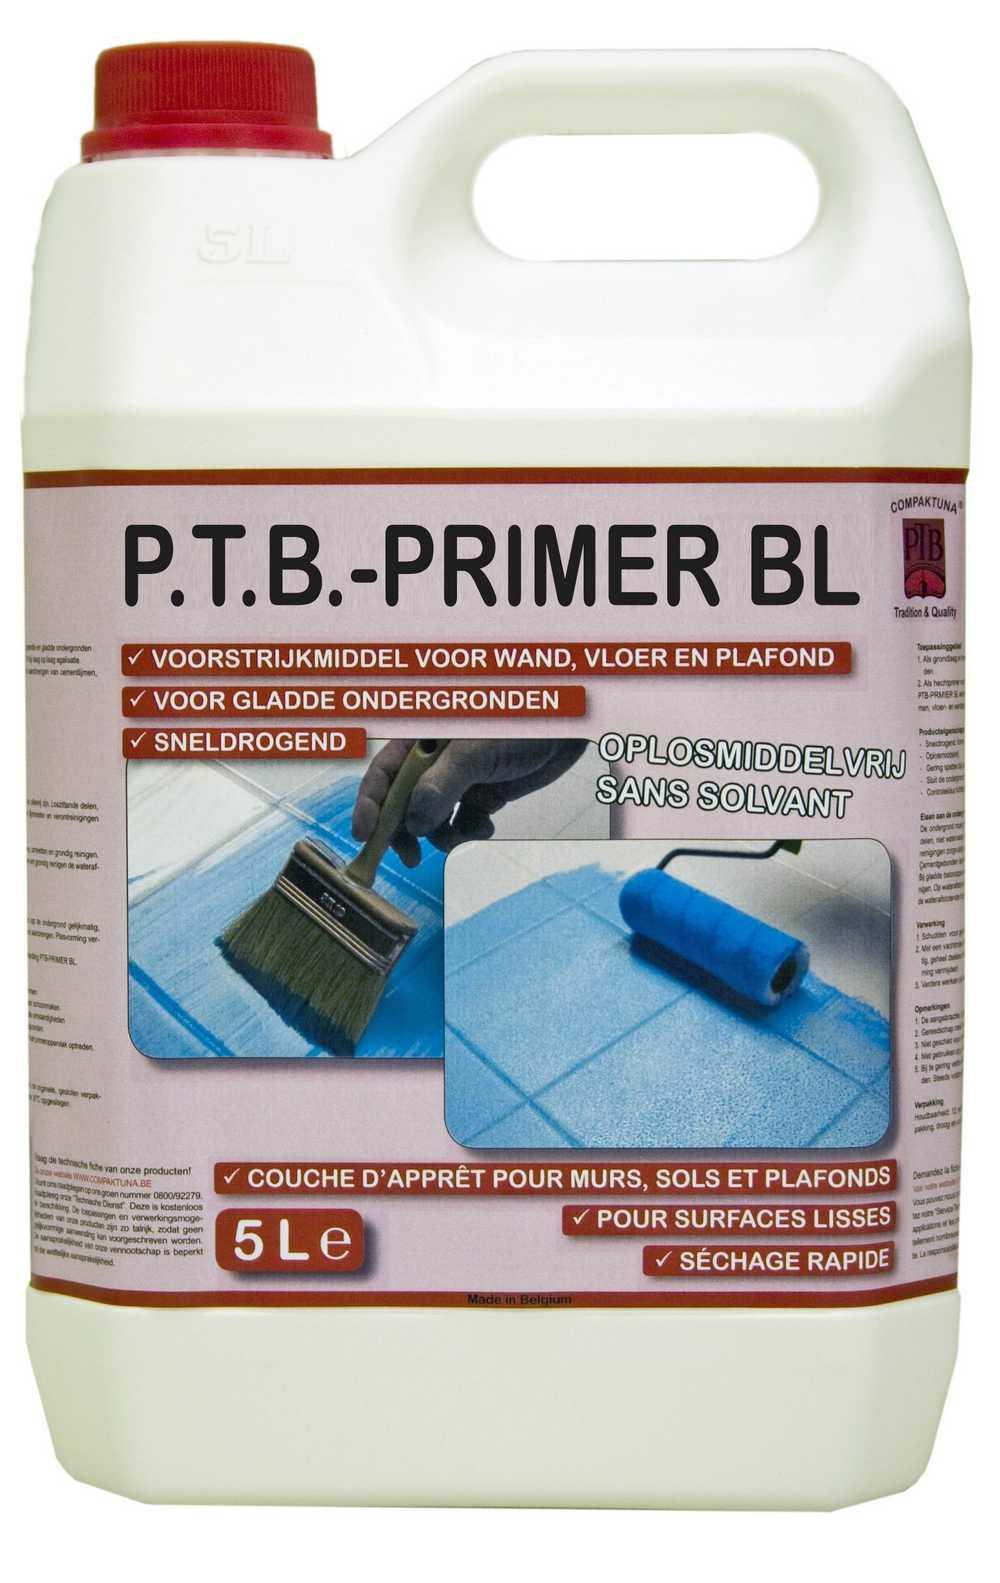 P.t.b.-primer Bl 5liter Lichtblauw